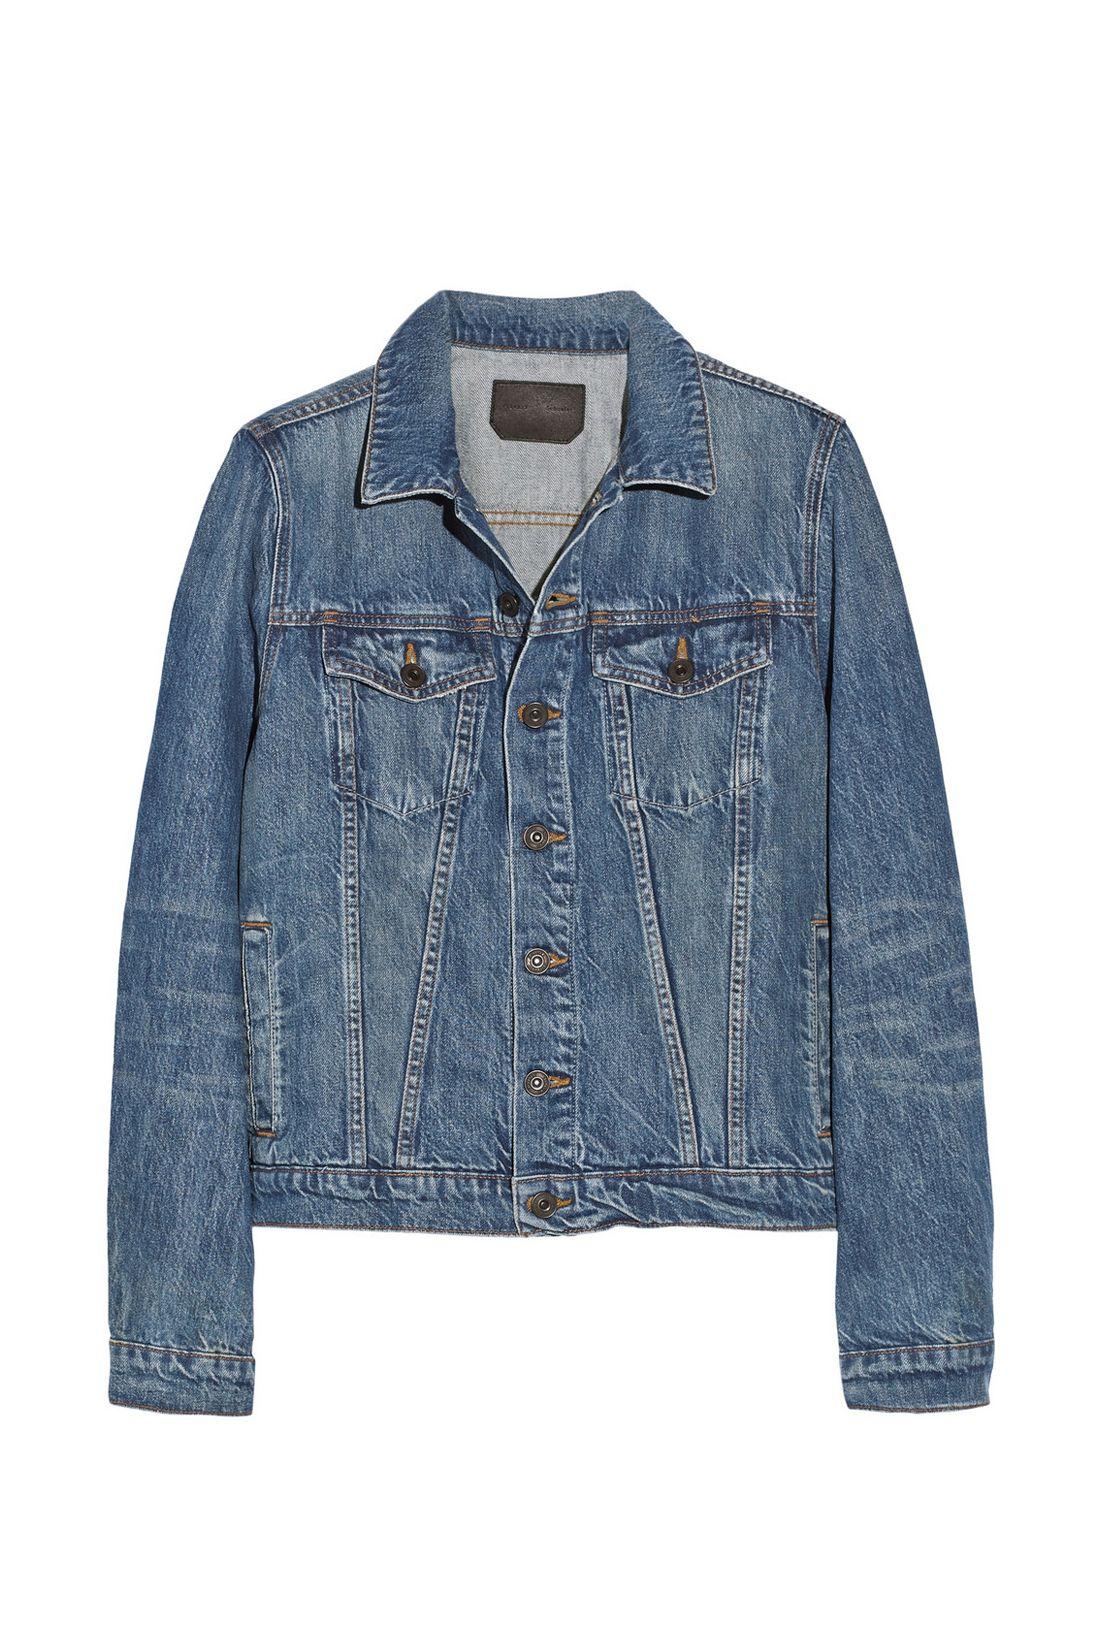 Buy The Best Fall Denim Jackets Gallery Style Com Fall Denim Jacket Jackets Vintage Jean Jacket [ 1640 x 1100 Pixel ]